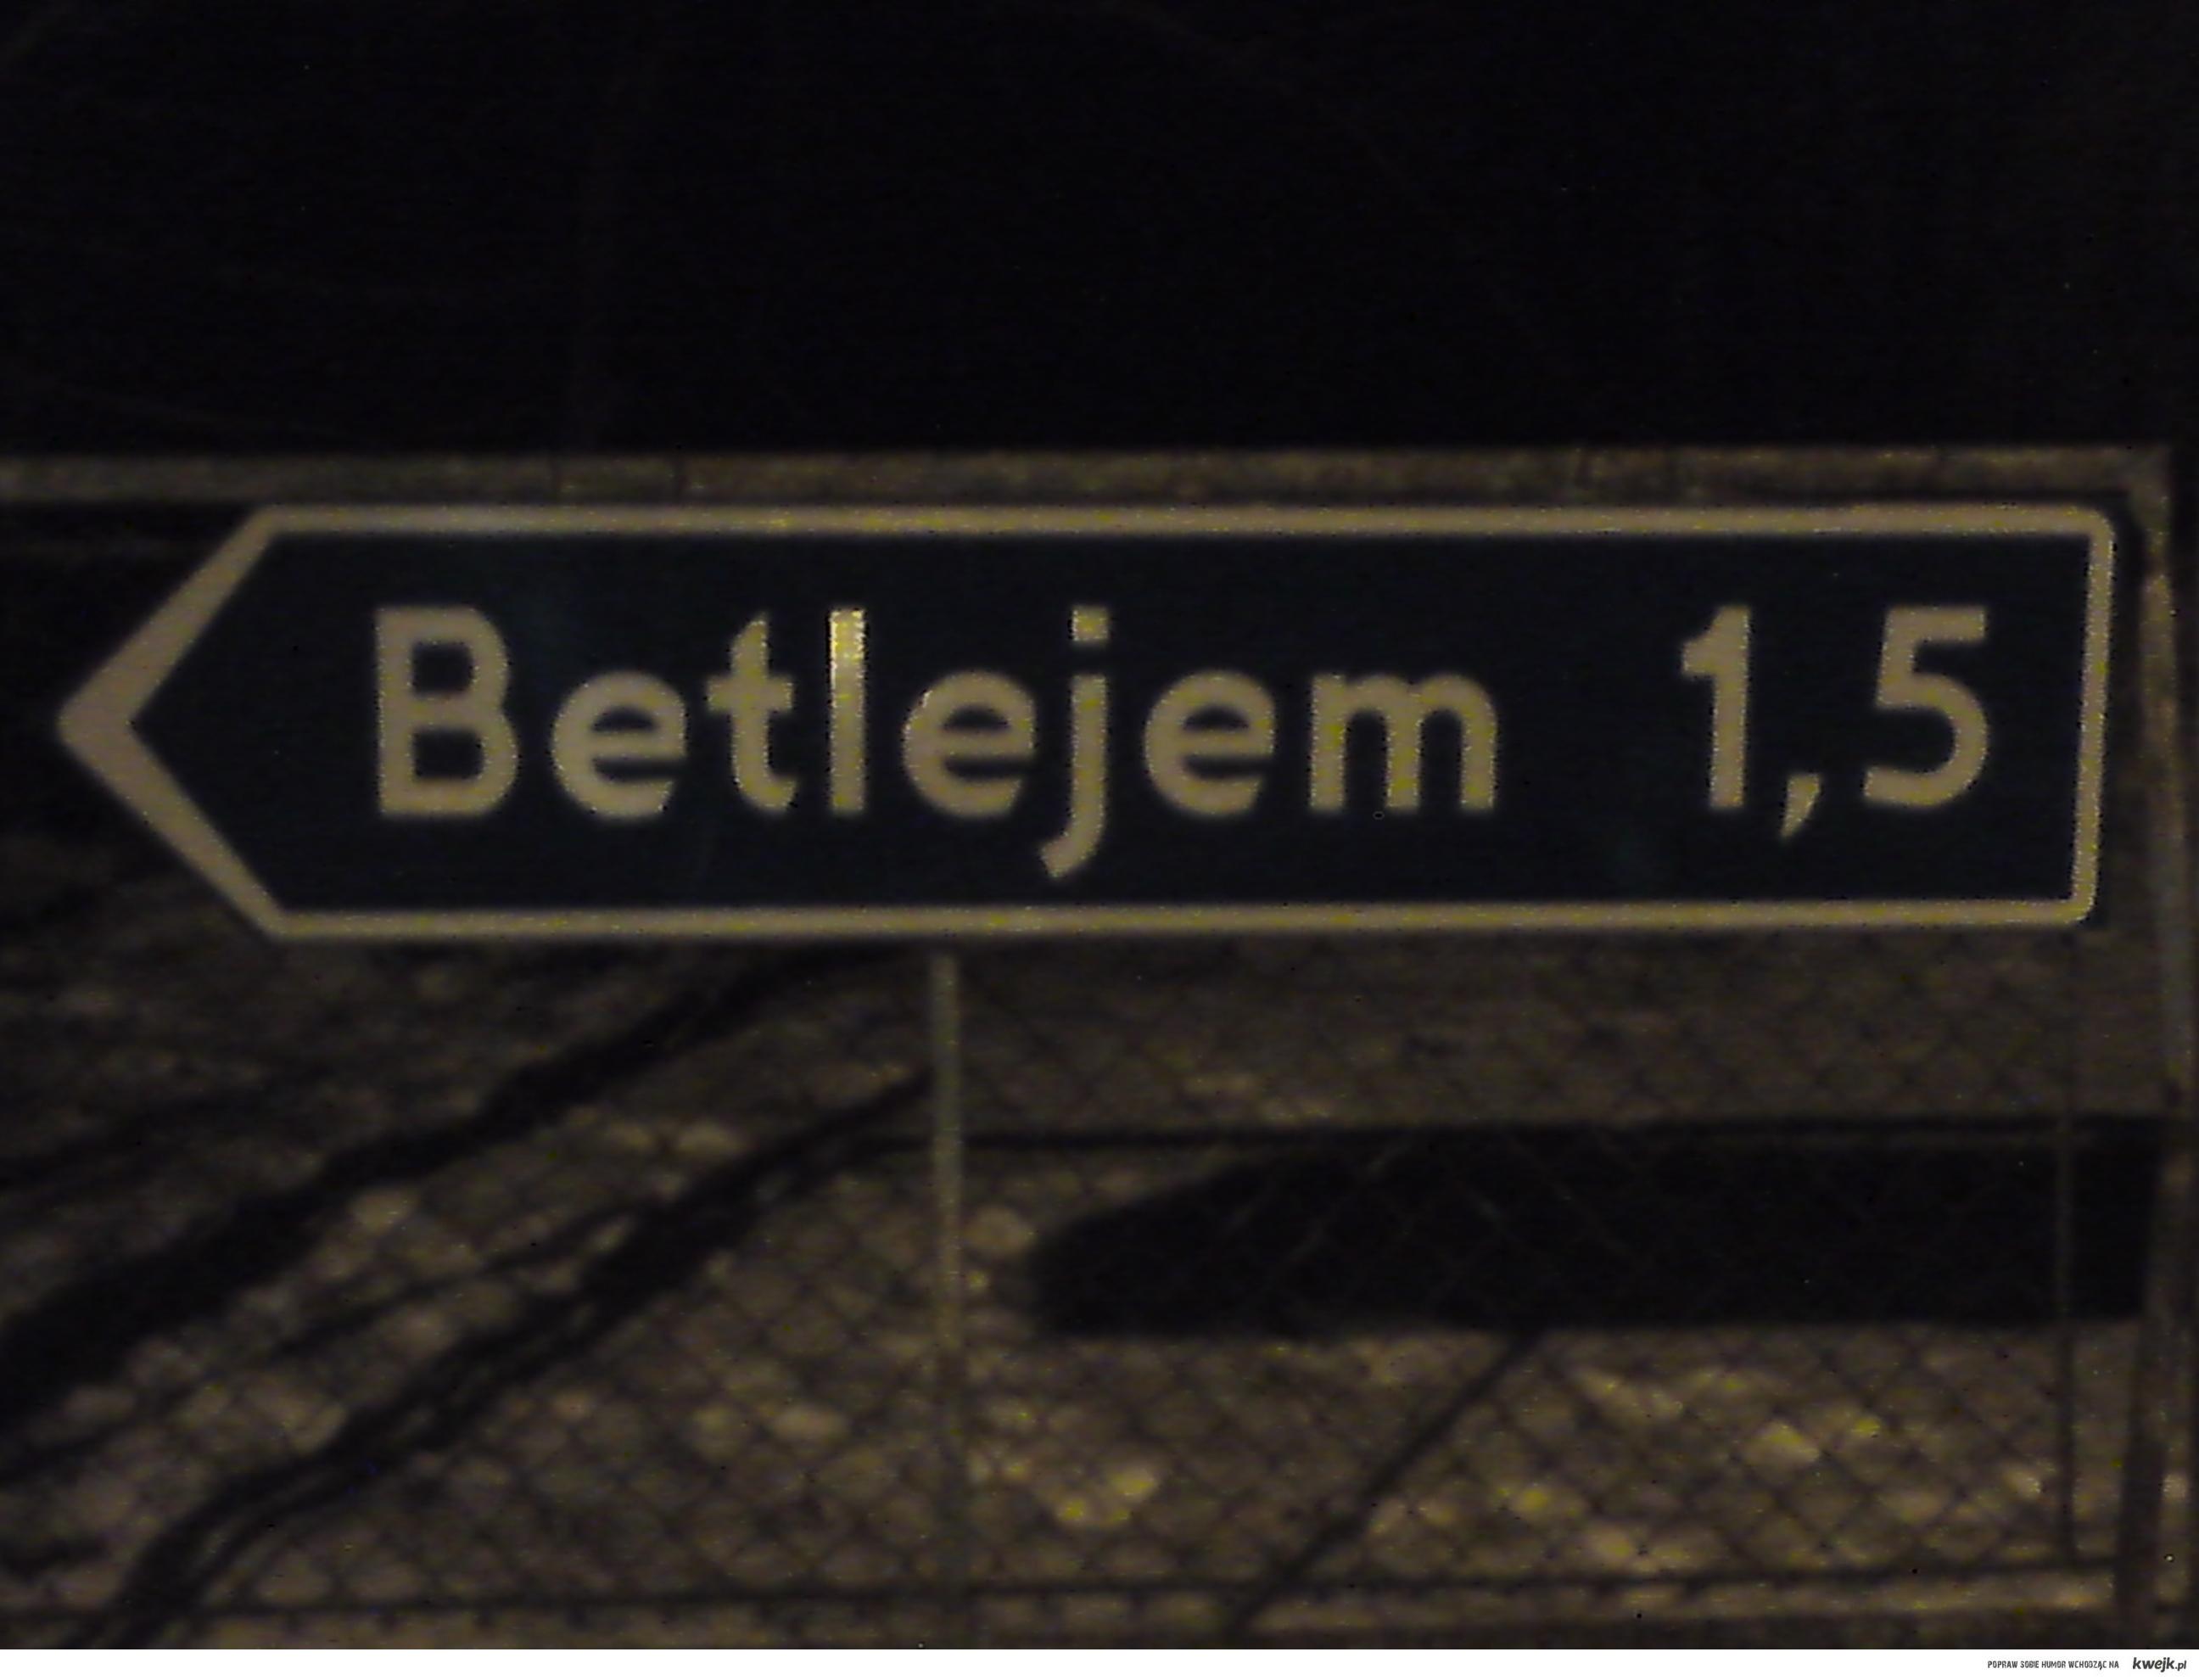 Betlejem w Polsce ;]